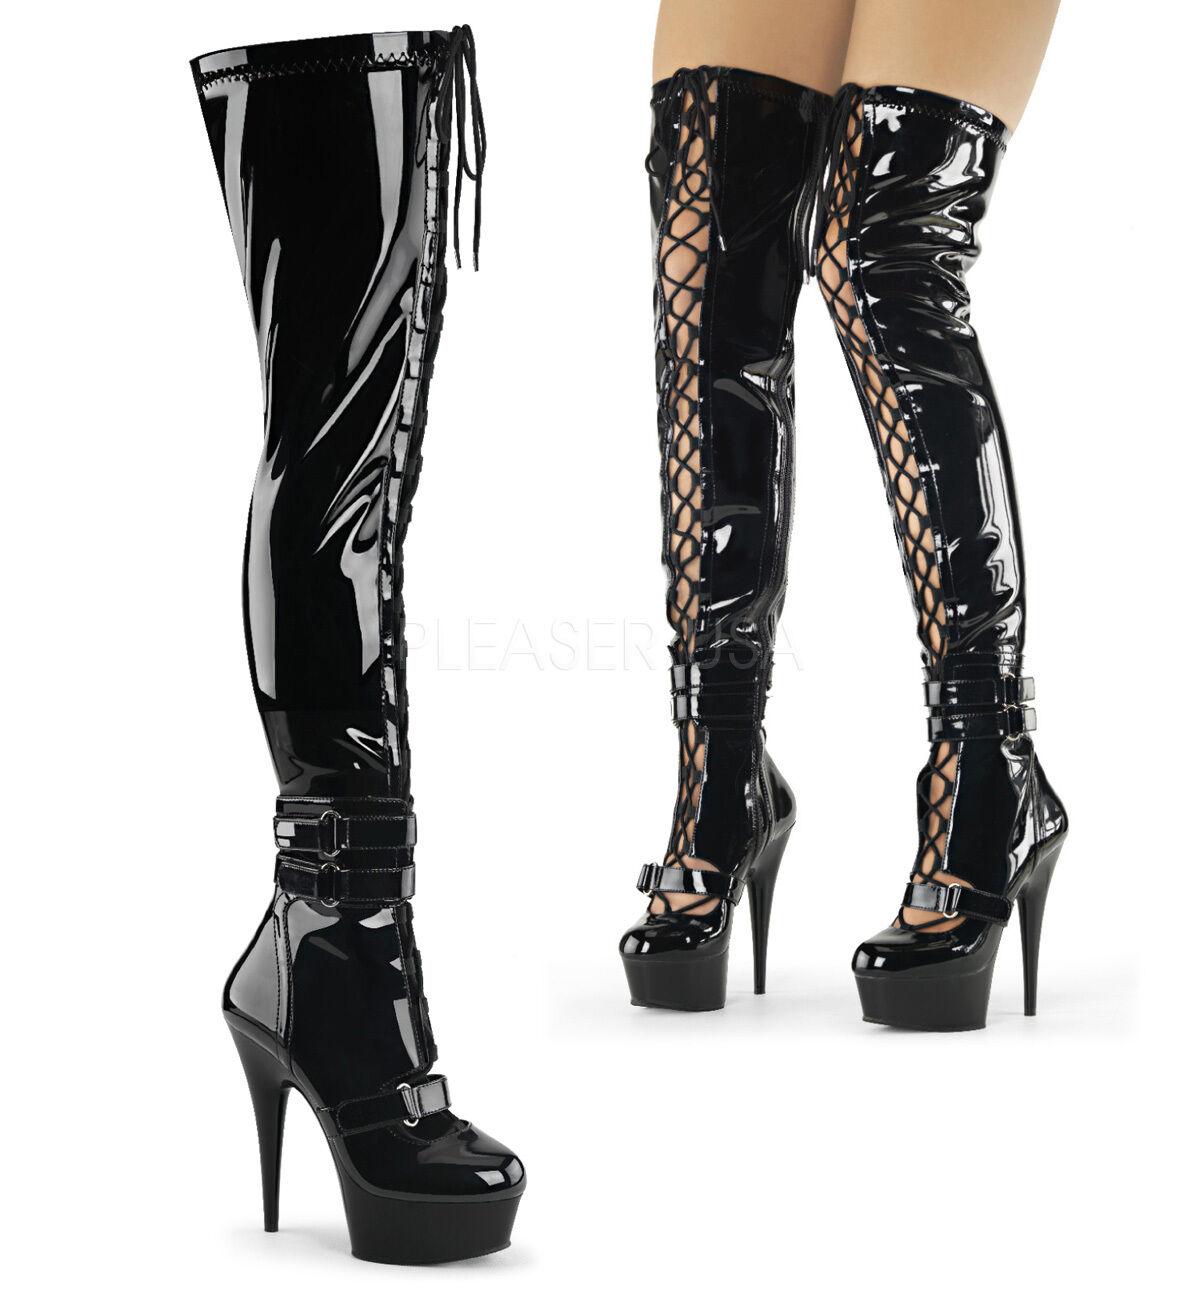 Delight Artena Black Matte or Patent Thigh High Boot Spike Heel Platform